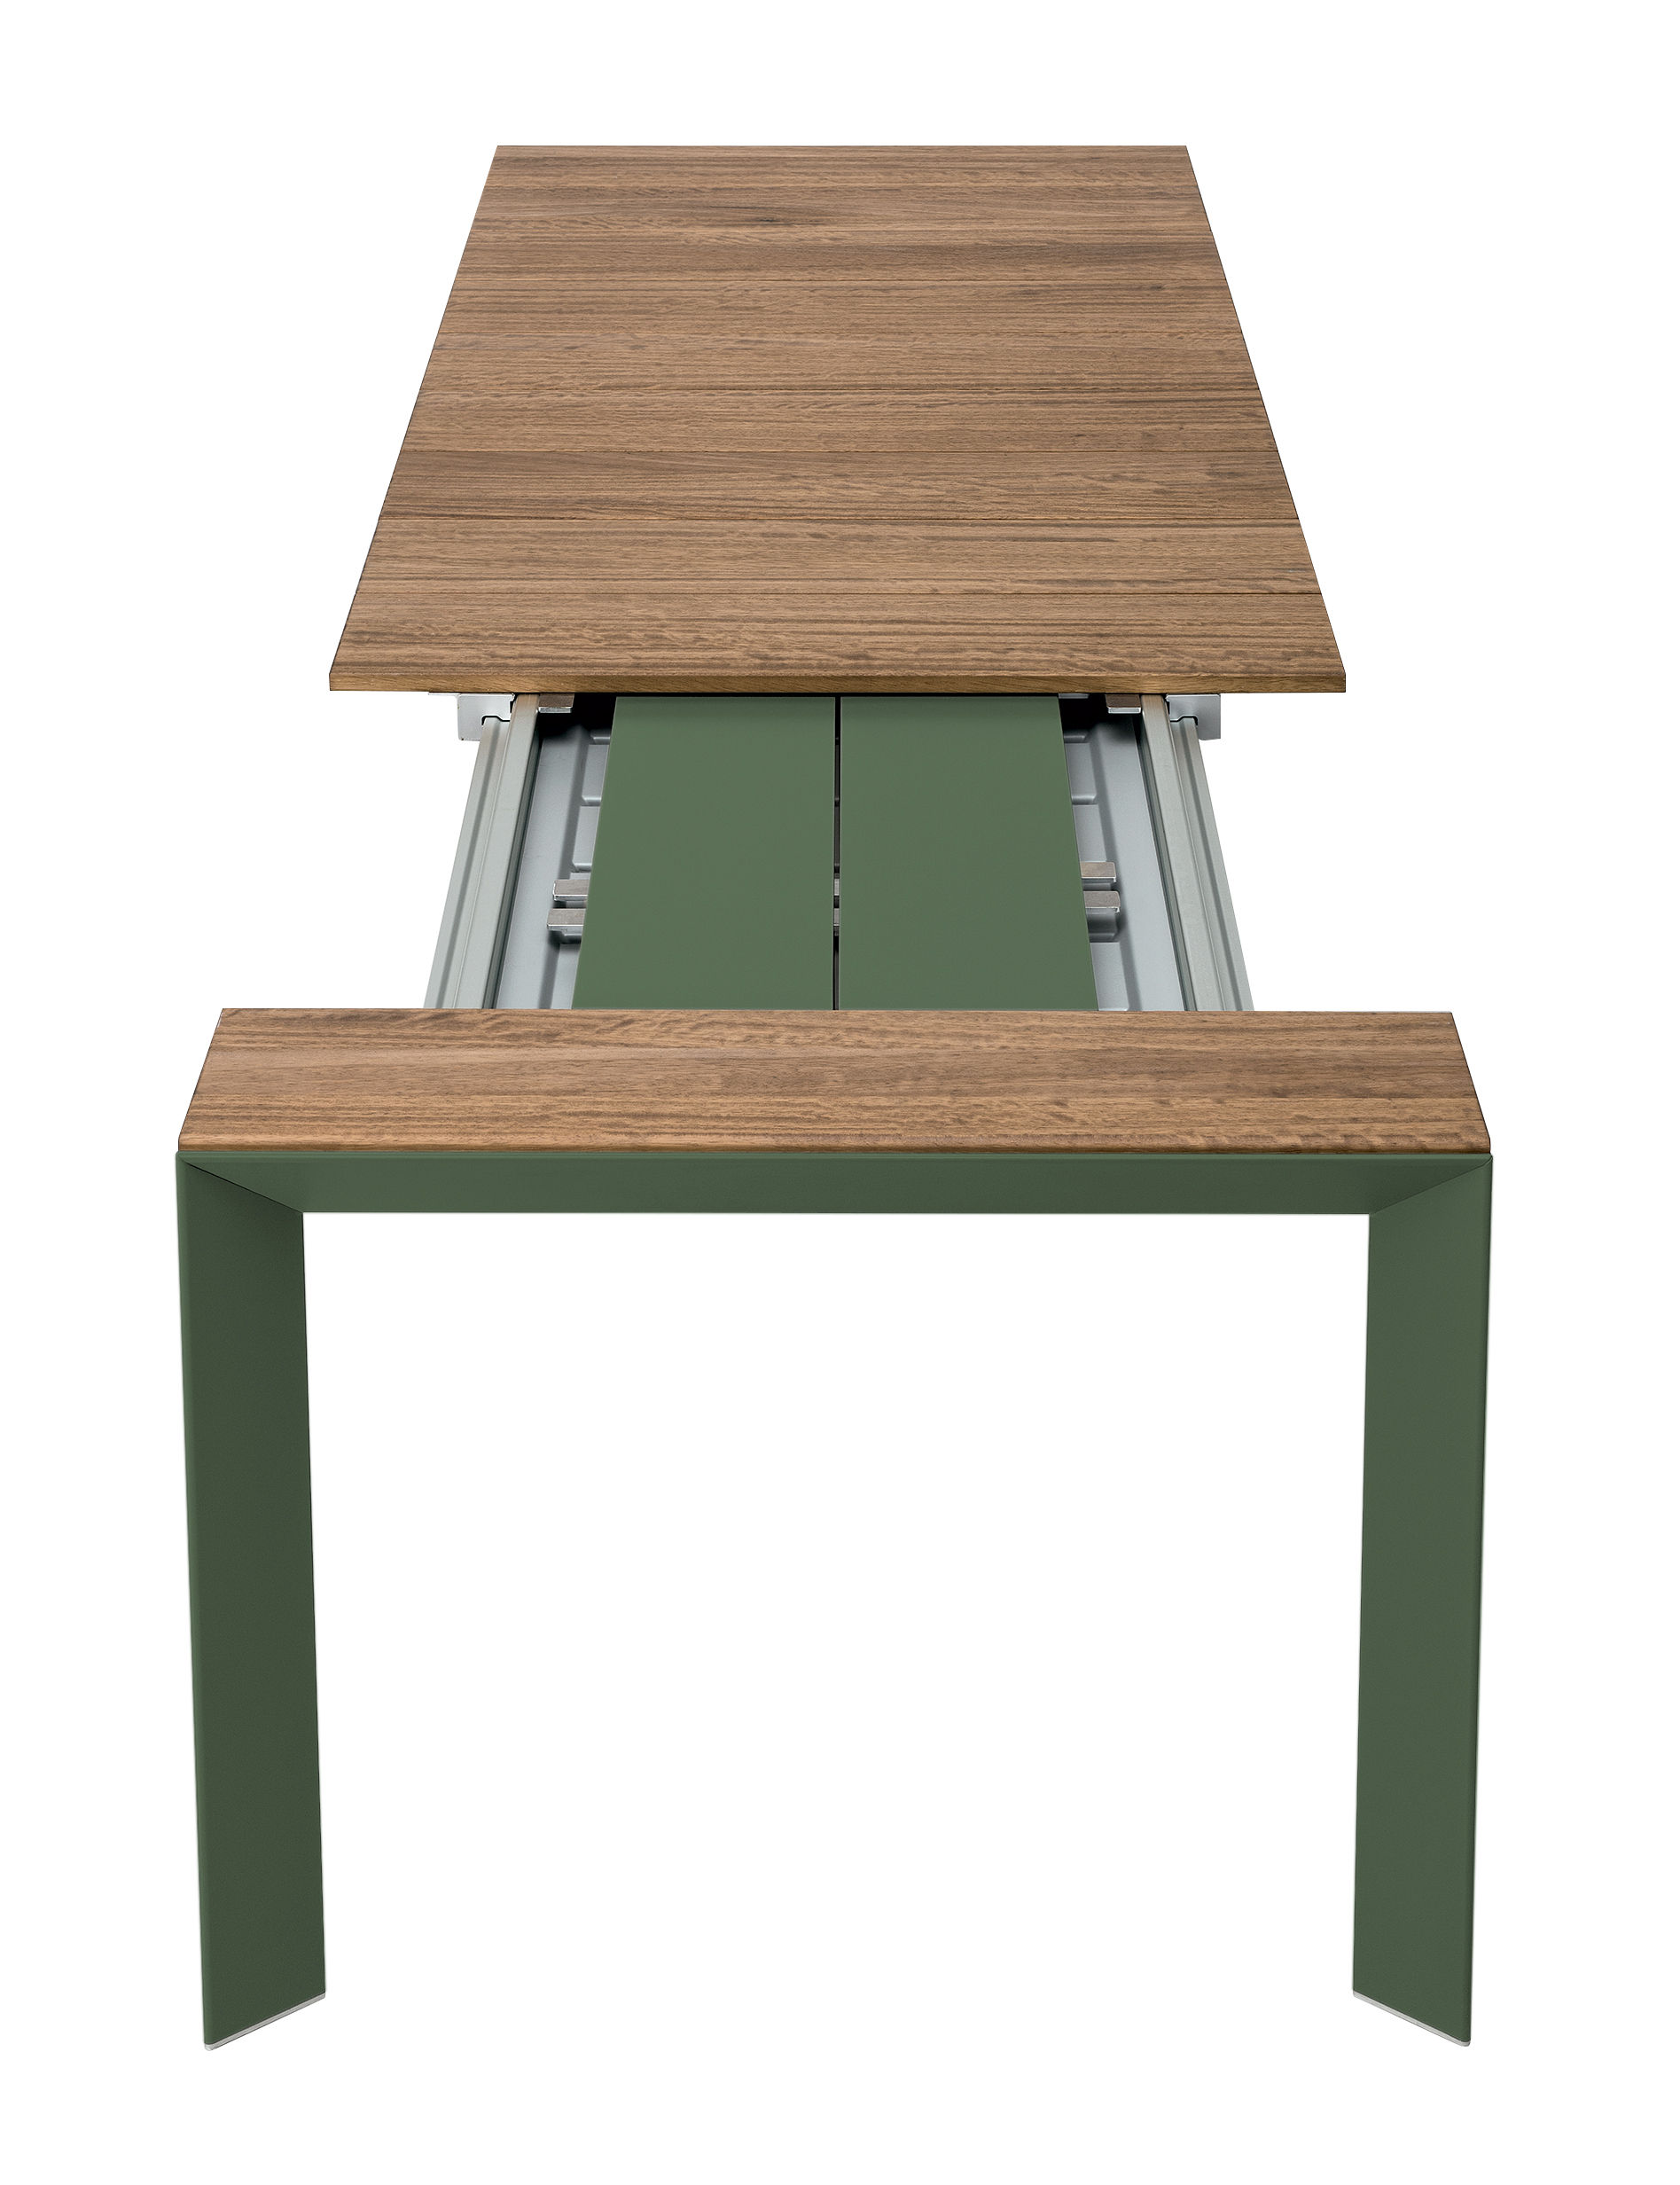 Outdoor - Garden Tables - Nori Extending table - / Teak - L 199 to 279 cm by Kristalia - Teak / Olive green - Anodized aluminium, Teak